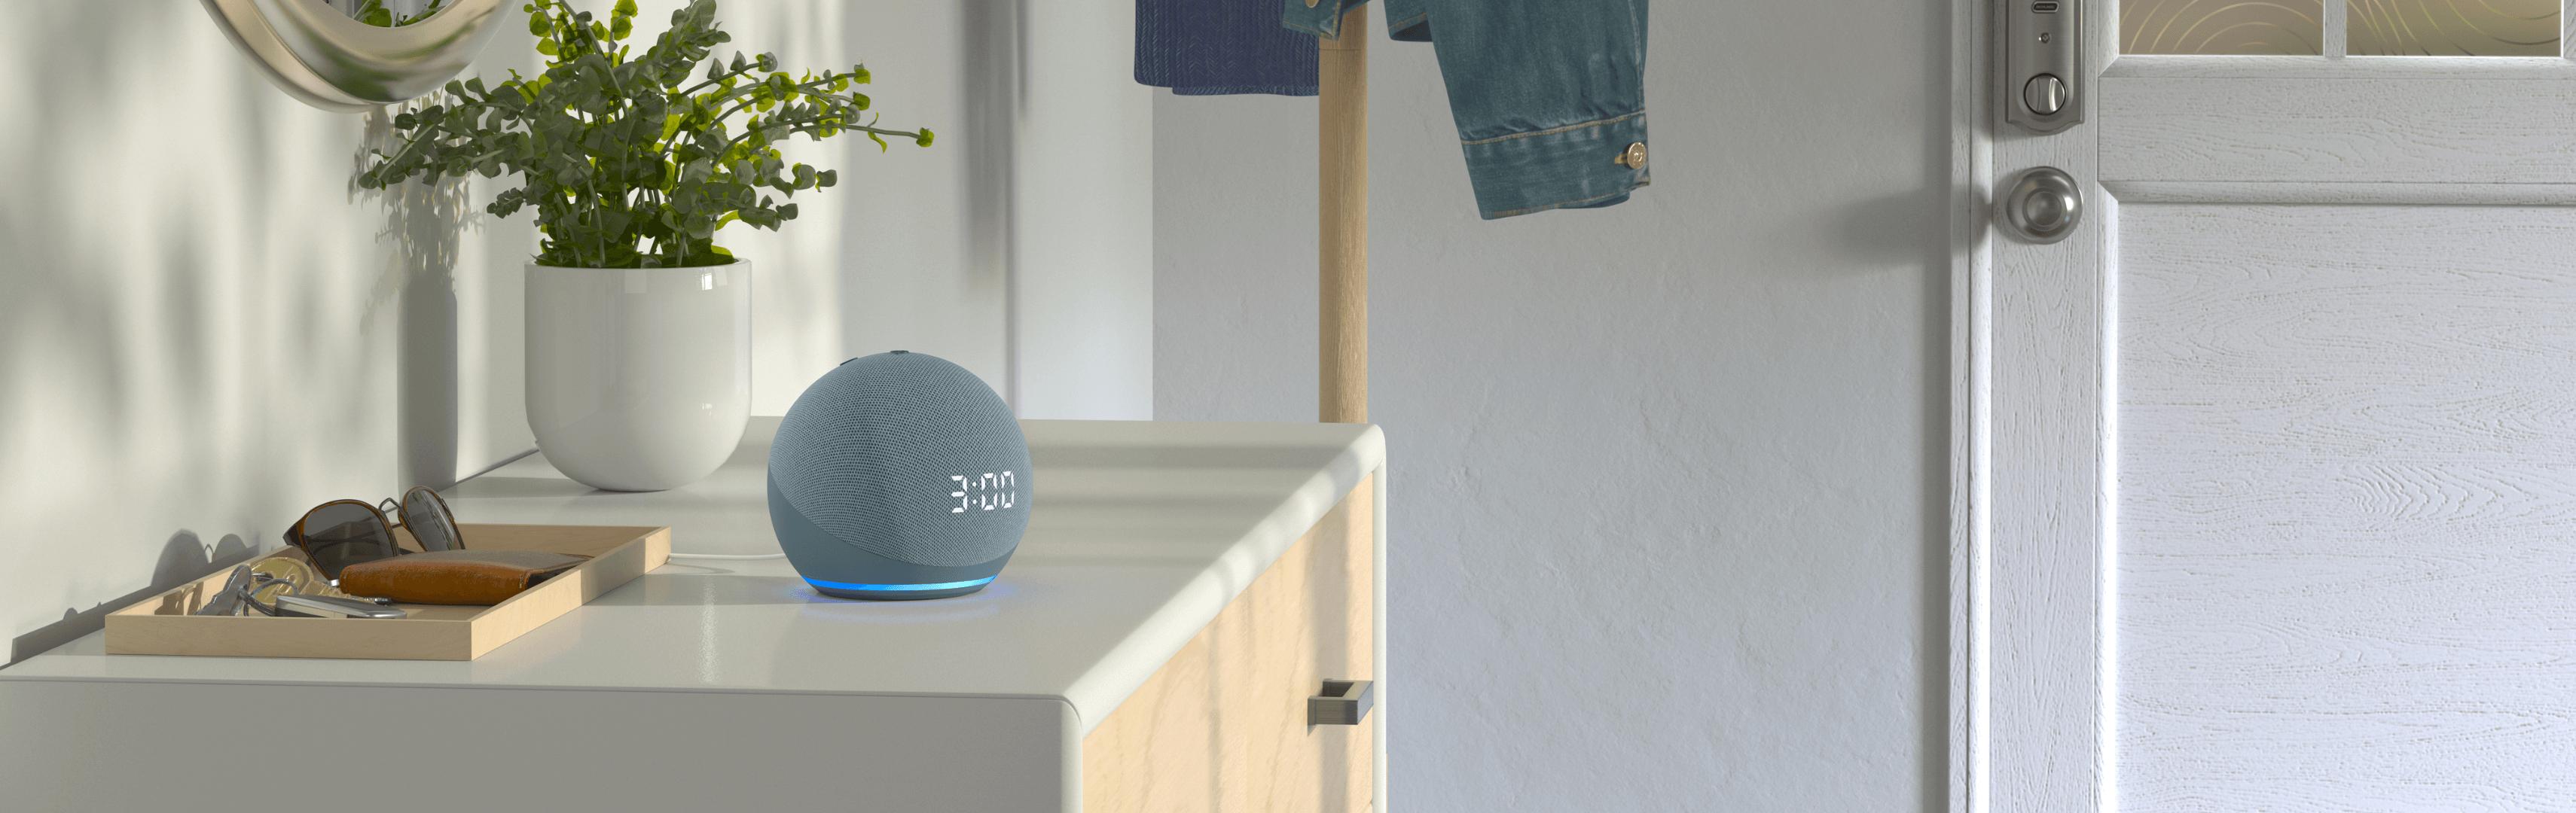 Find with Tile on Google Nest